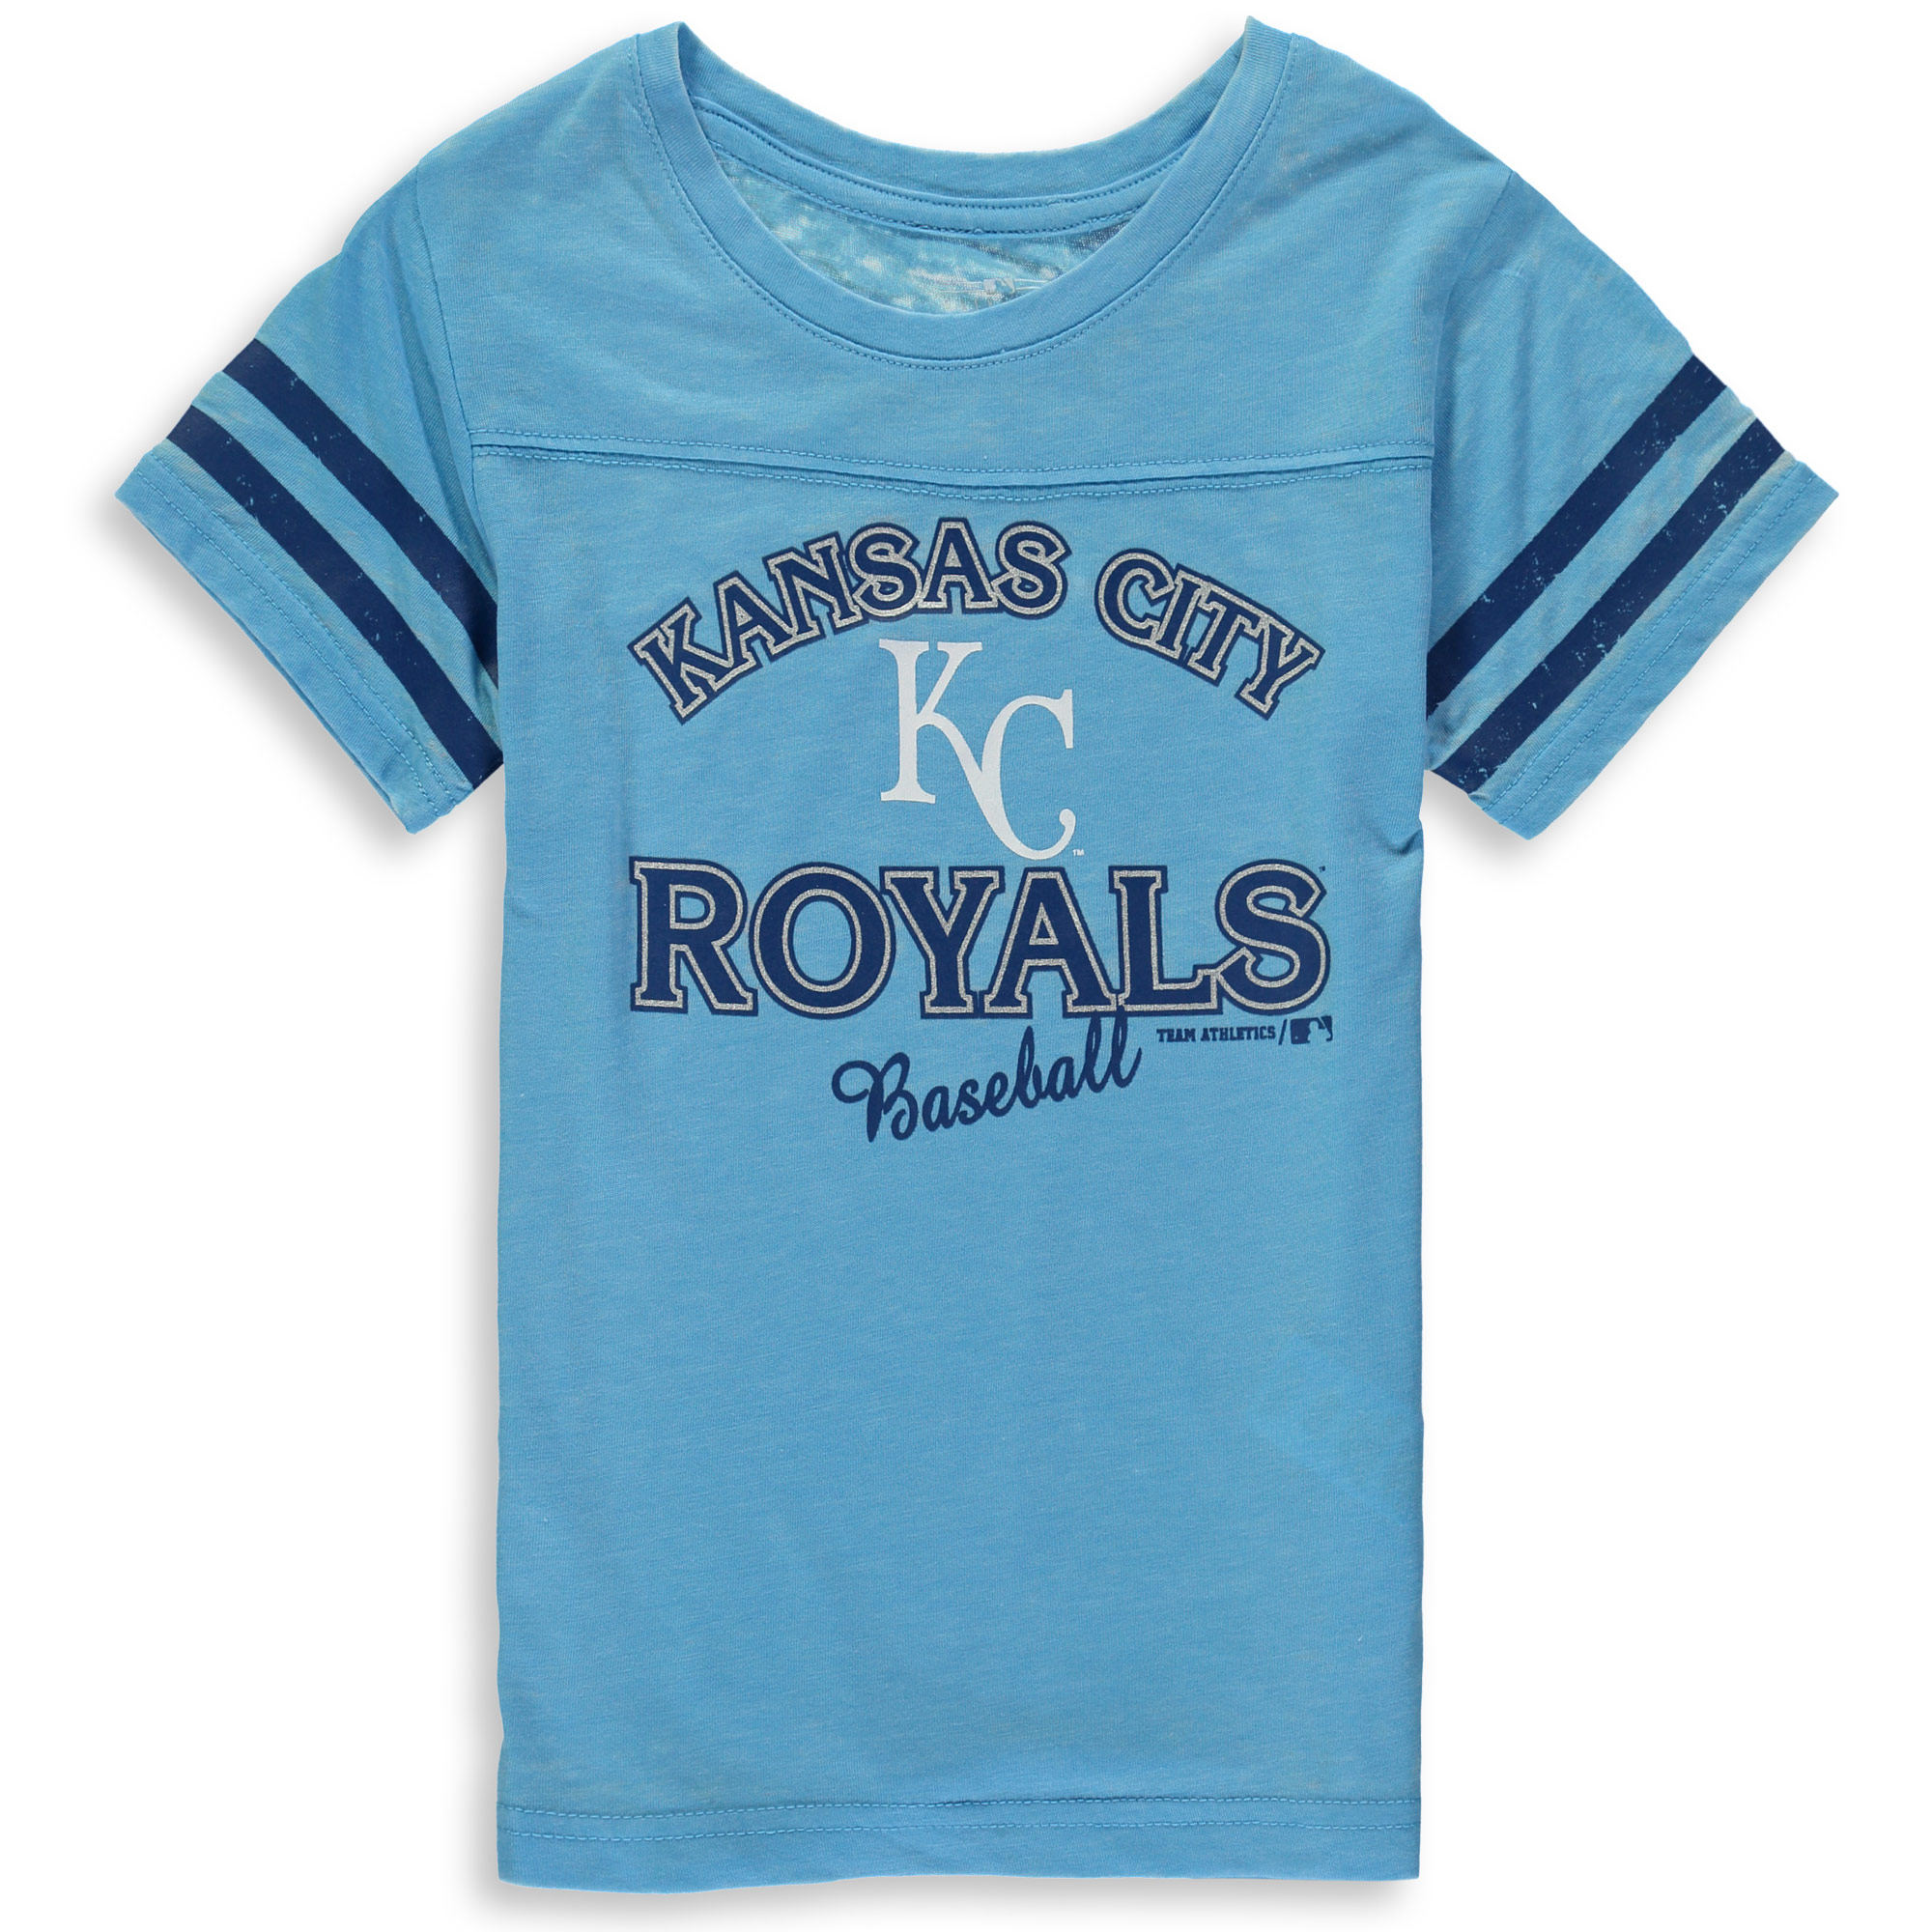 MLB Kansas City ROYALS TEE Short Sleeve Girls Fashion 60% Cotton 40% Polyester Alternate Team Colors 7 - 16